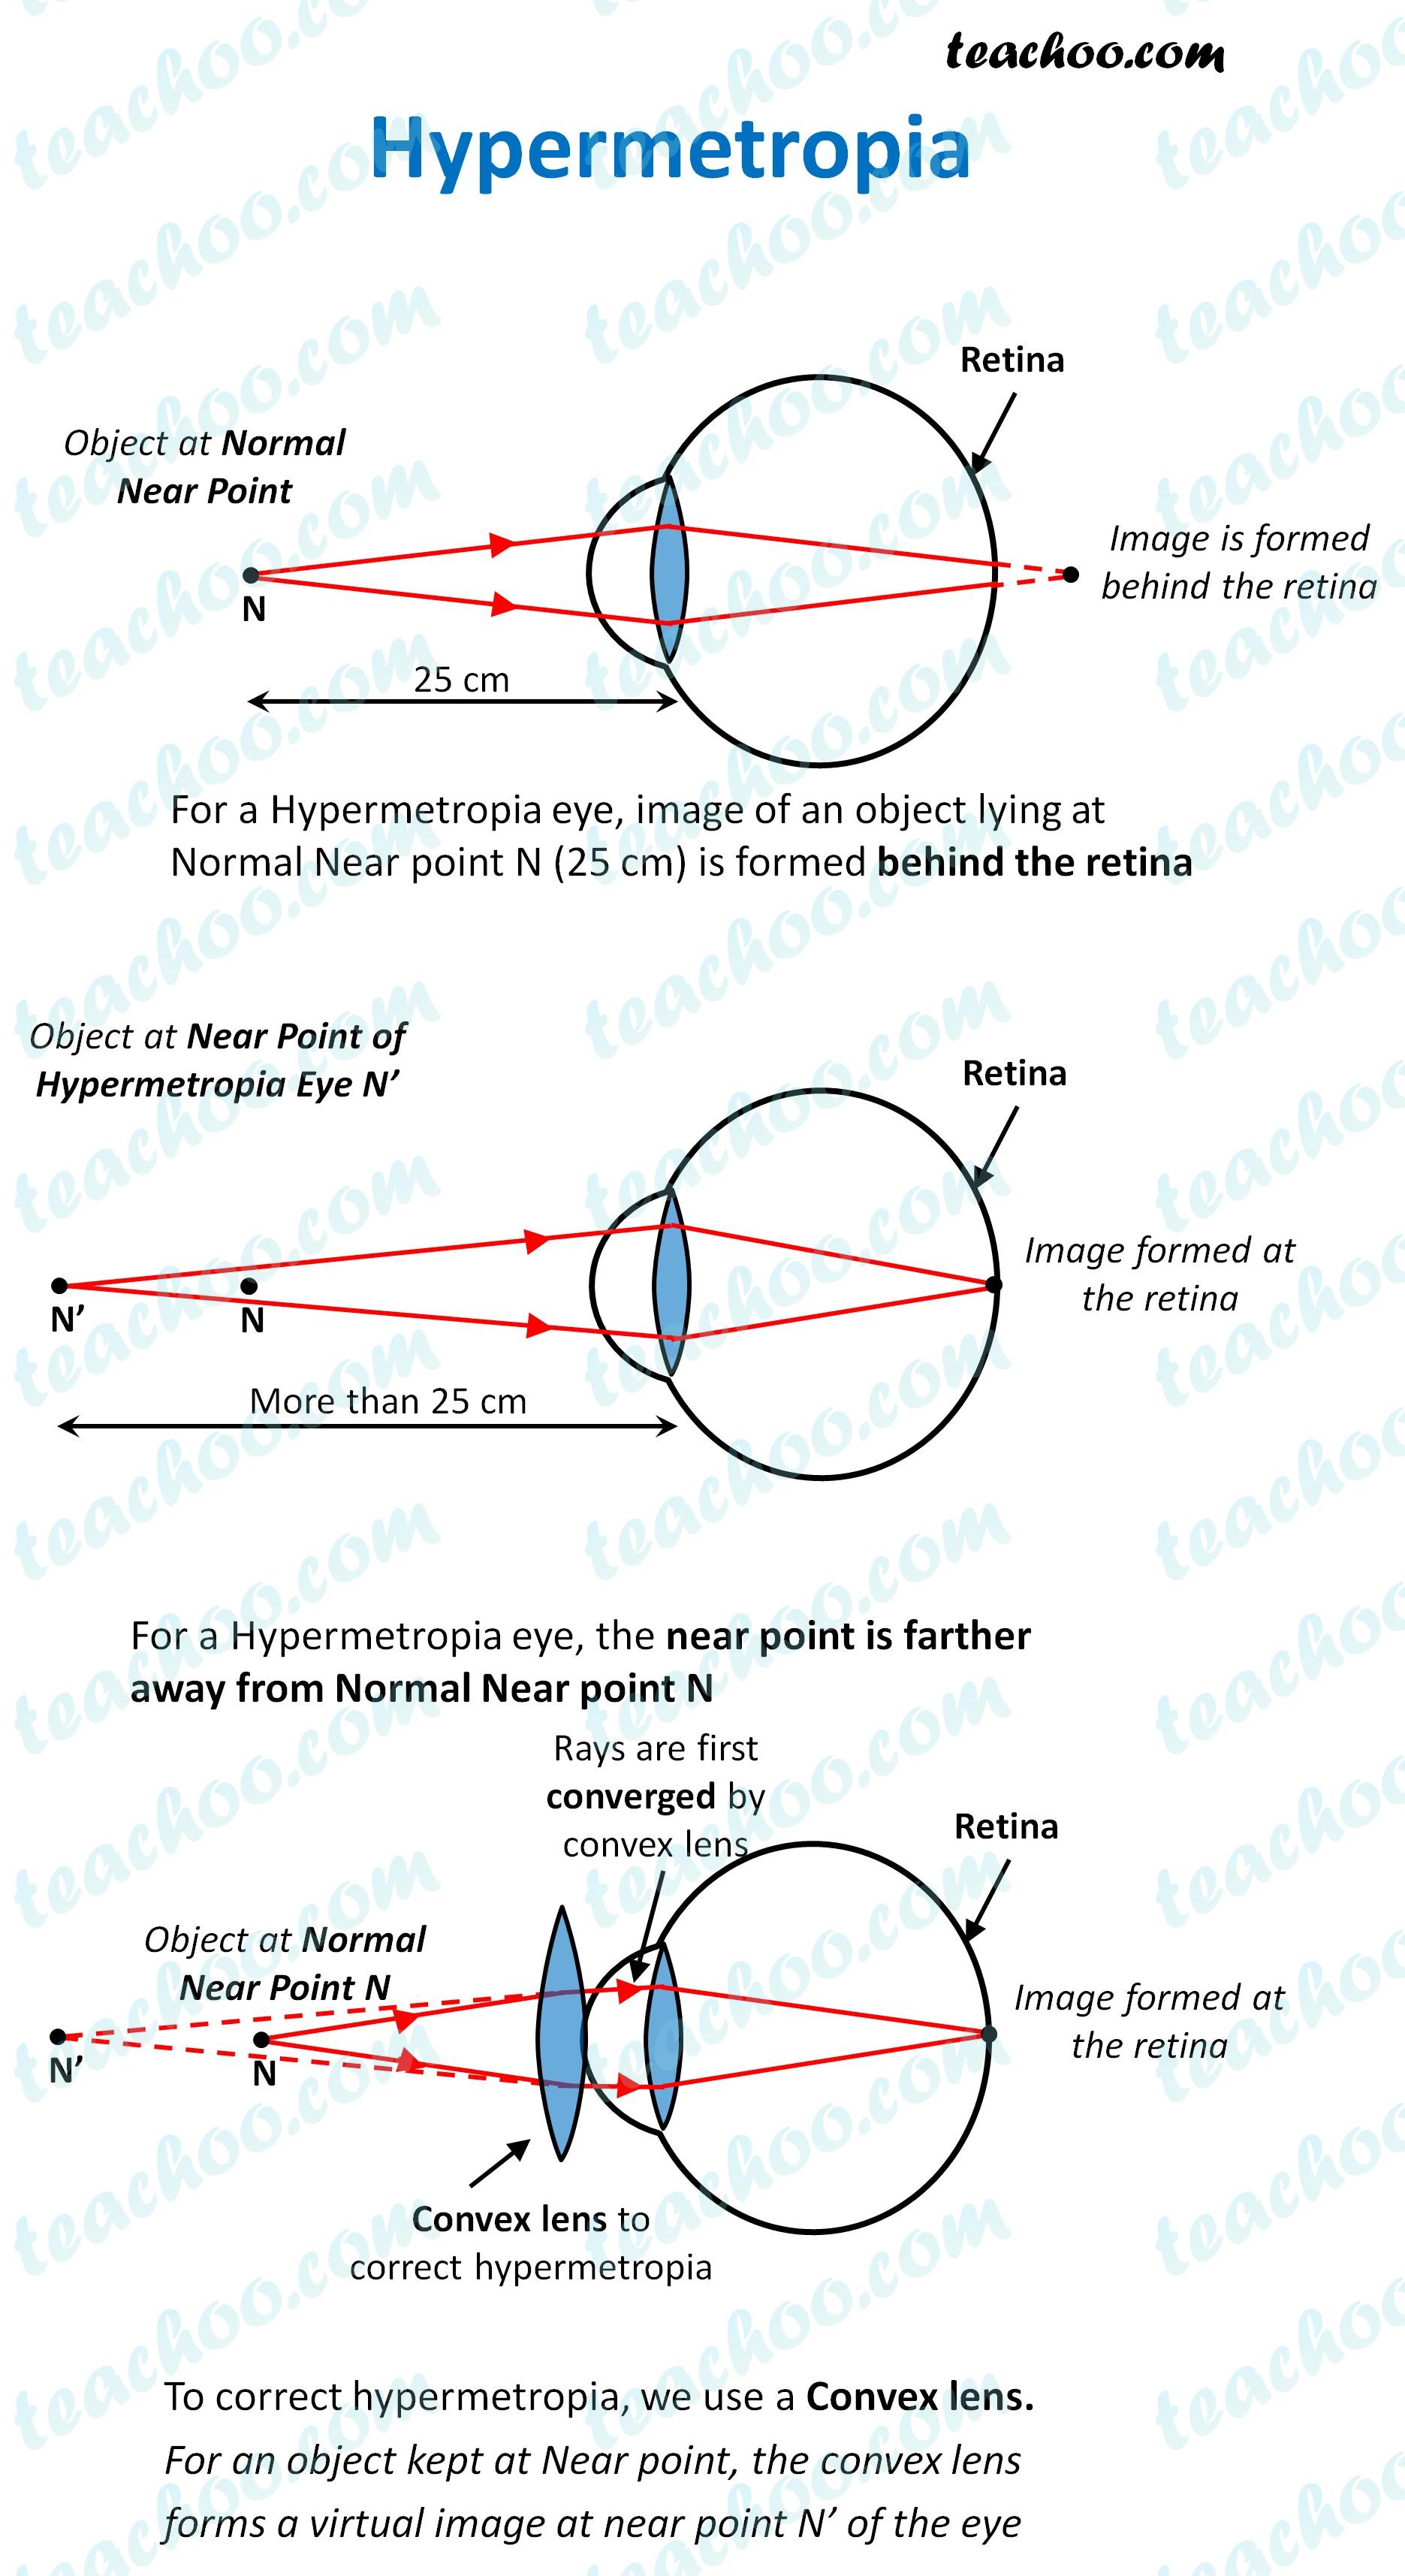 hypermetropia---teachoo.jpg